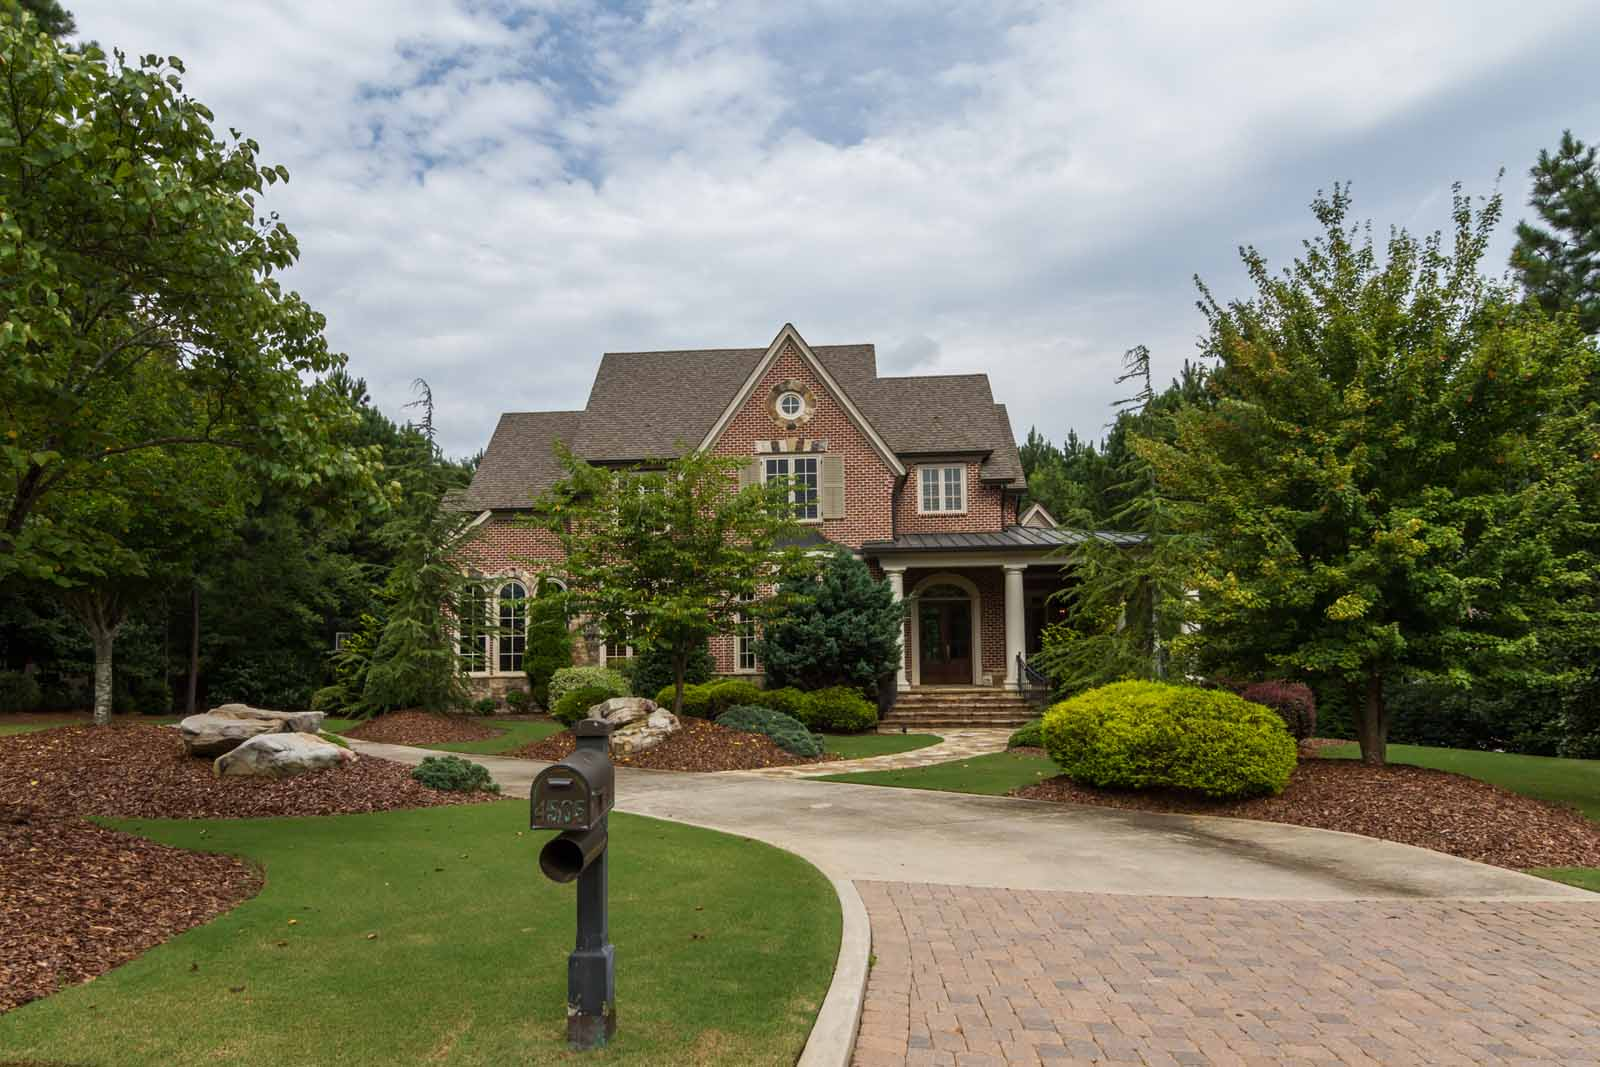 獨棟家庭住宅 為 出售 在 Welcome Home 4505 Whitestone Way Suwanee, 喬治亞州 30024 美國